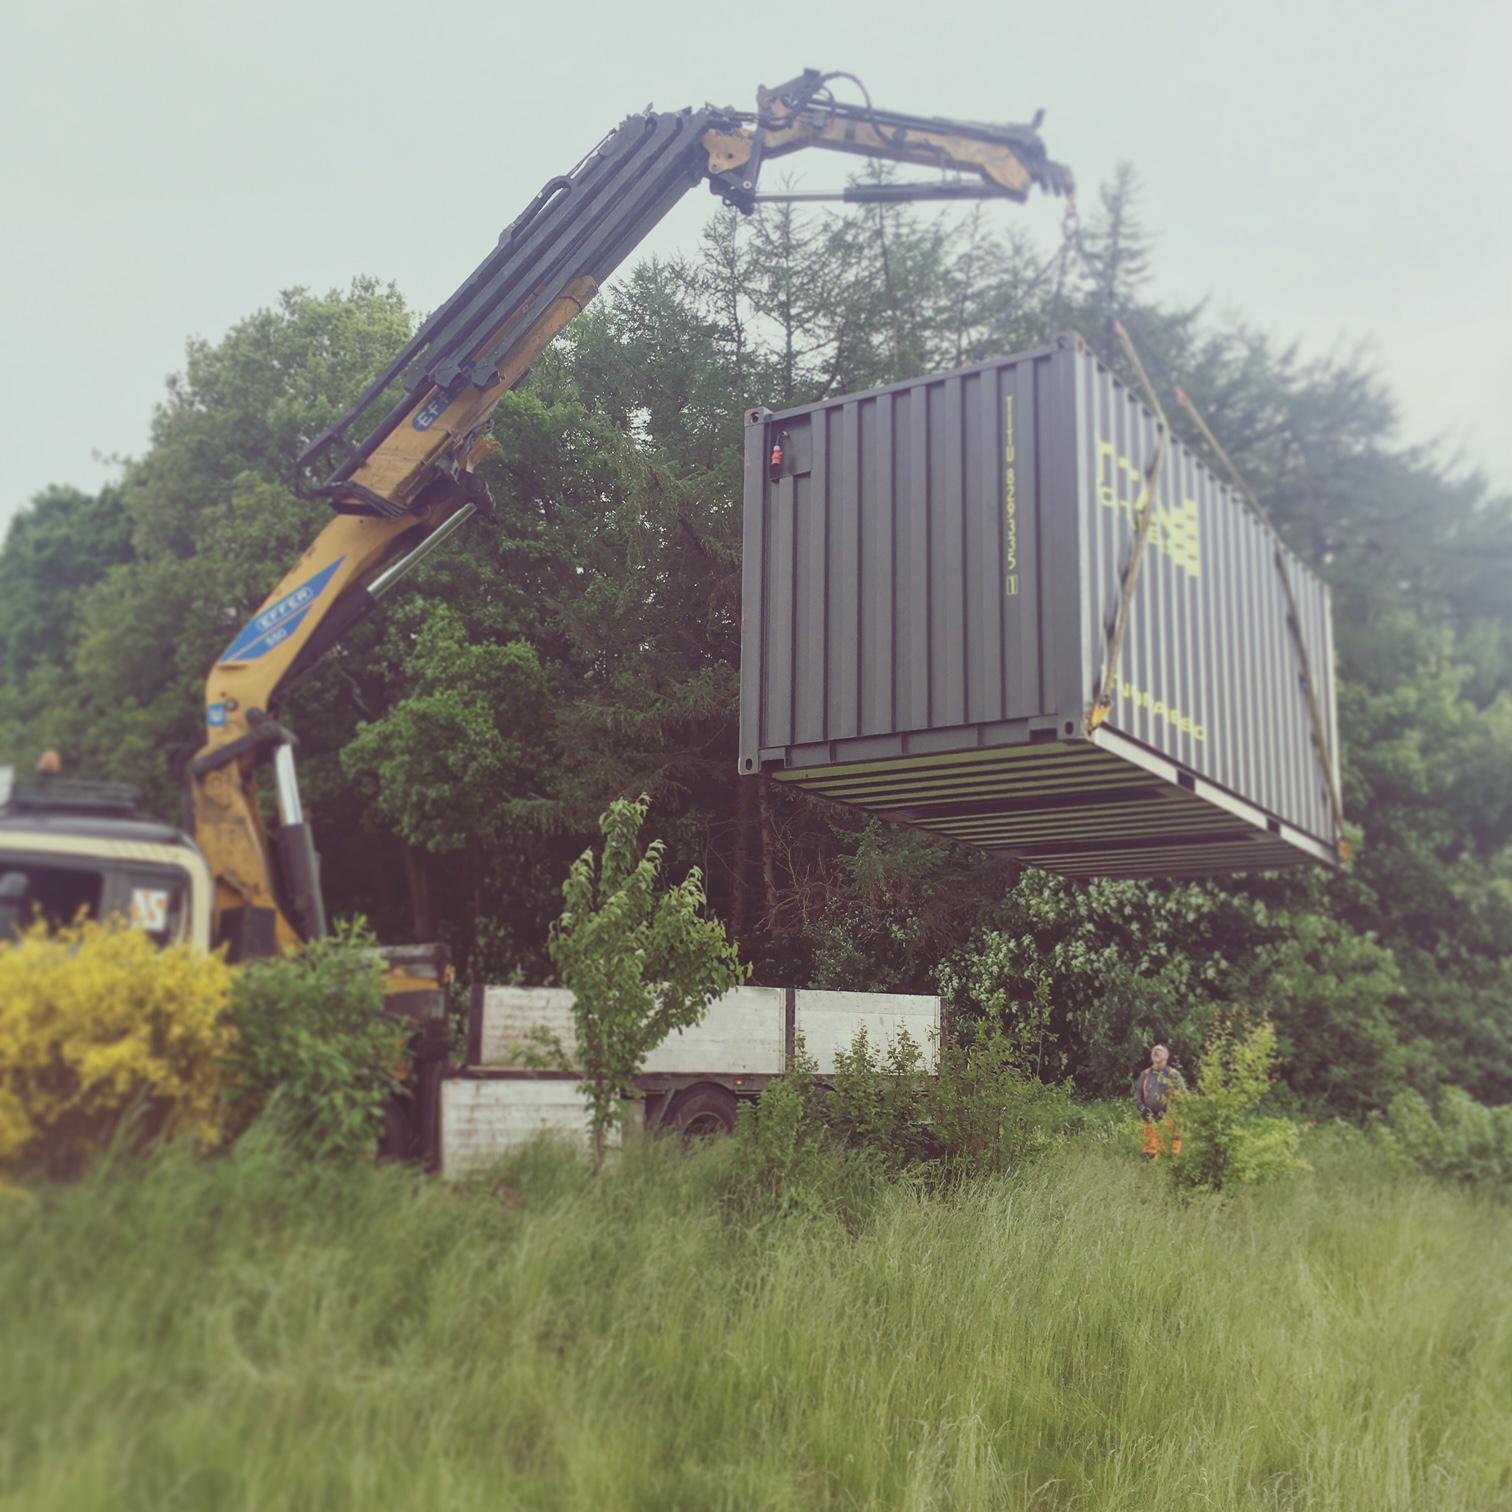 Containeren hvor vi oppbevarer flyttelasset og værktøy